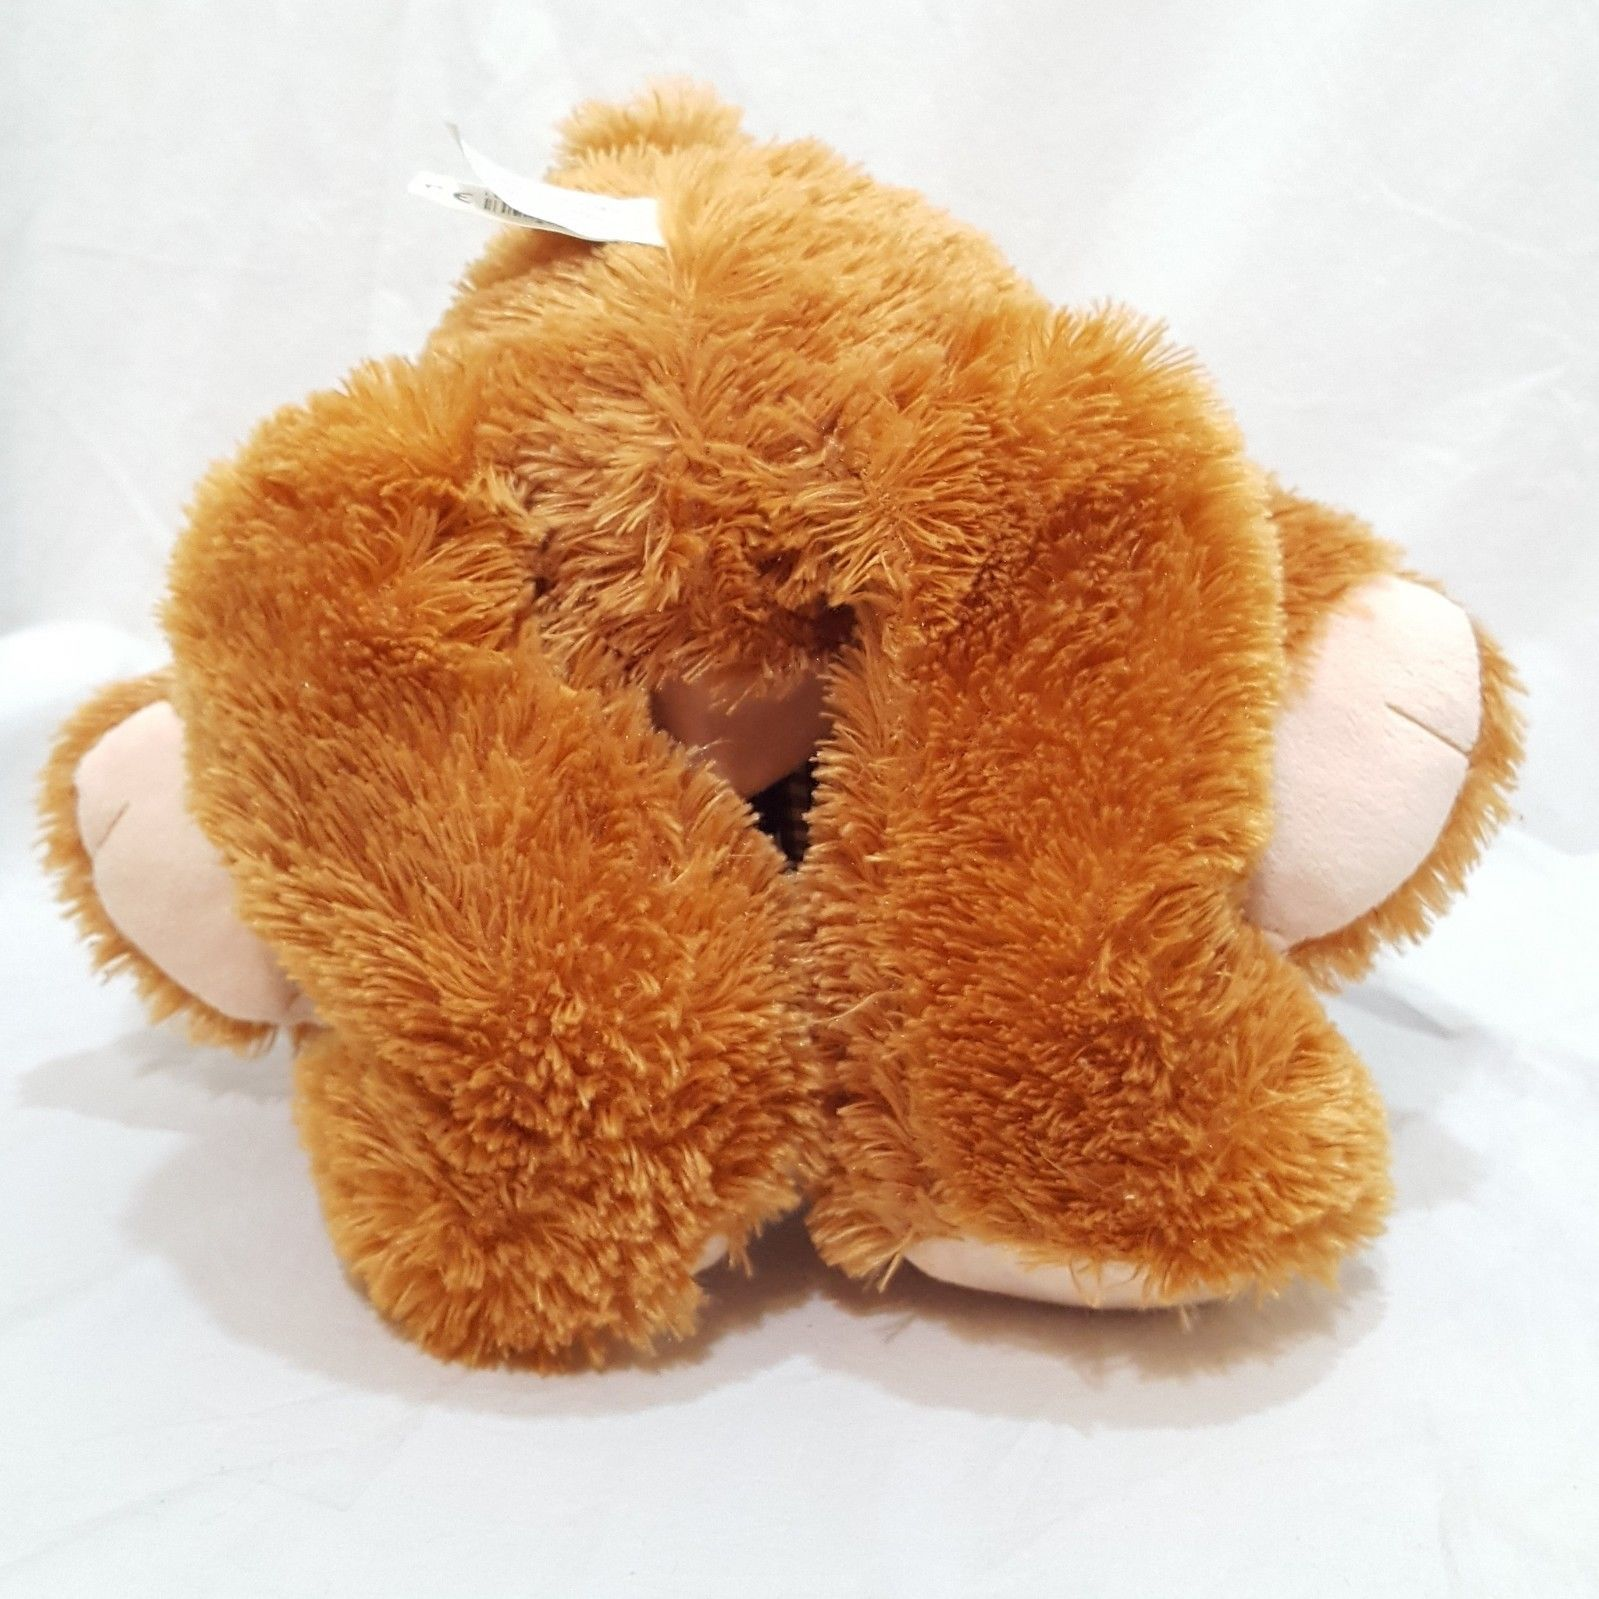 "Brown Teddy Bear Plush Stuffed Animal 22"" Classic Toy Co Plaid Bow"